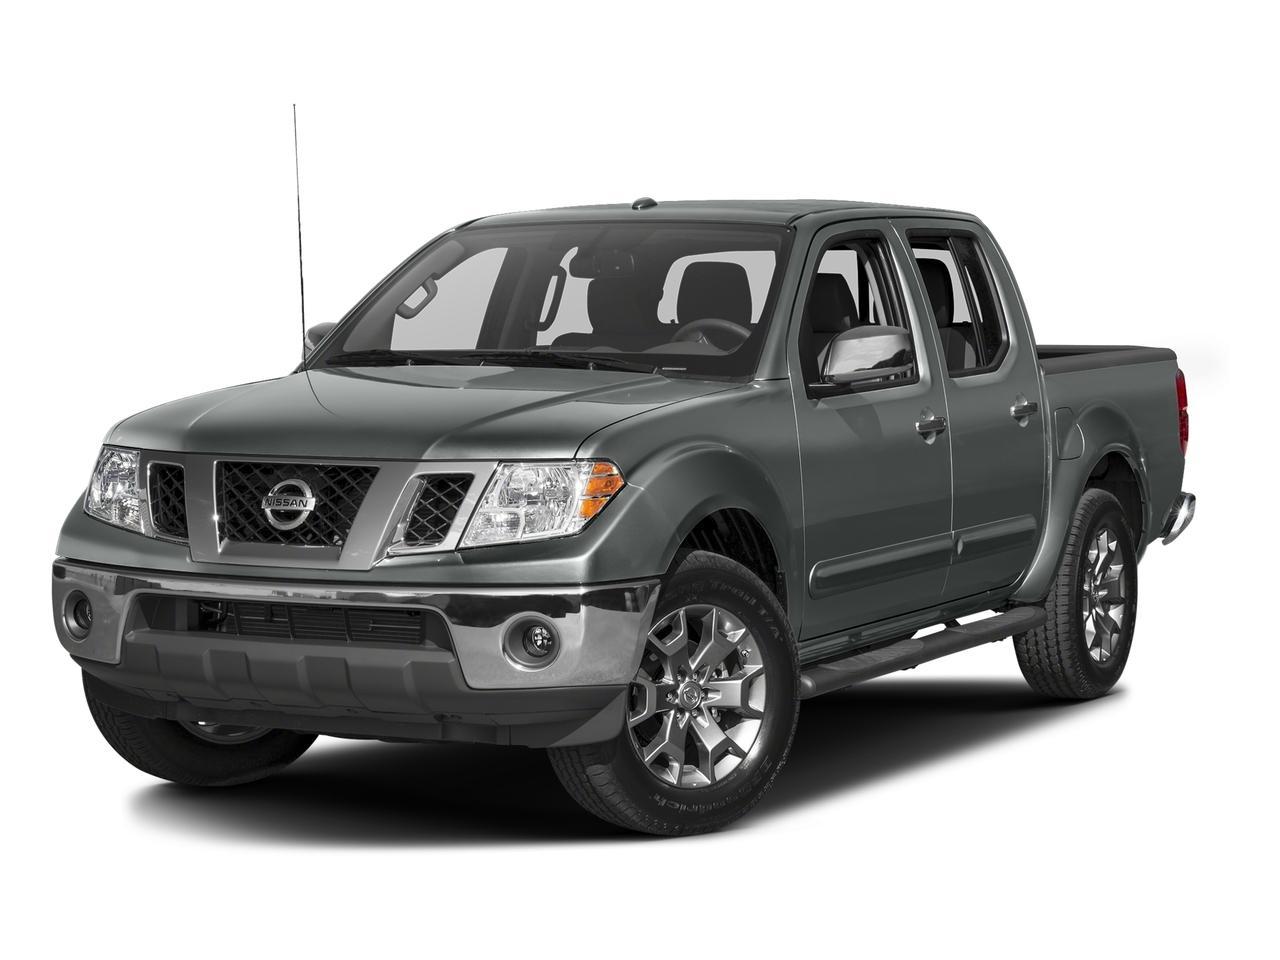 2016 Nissan Frontier Vehicle Photo in Manassas, VA 20109